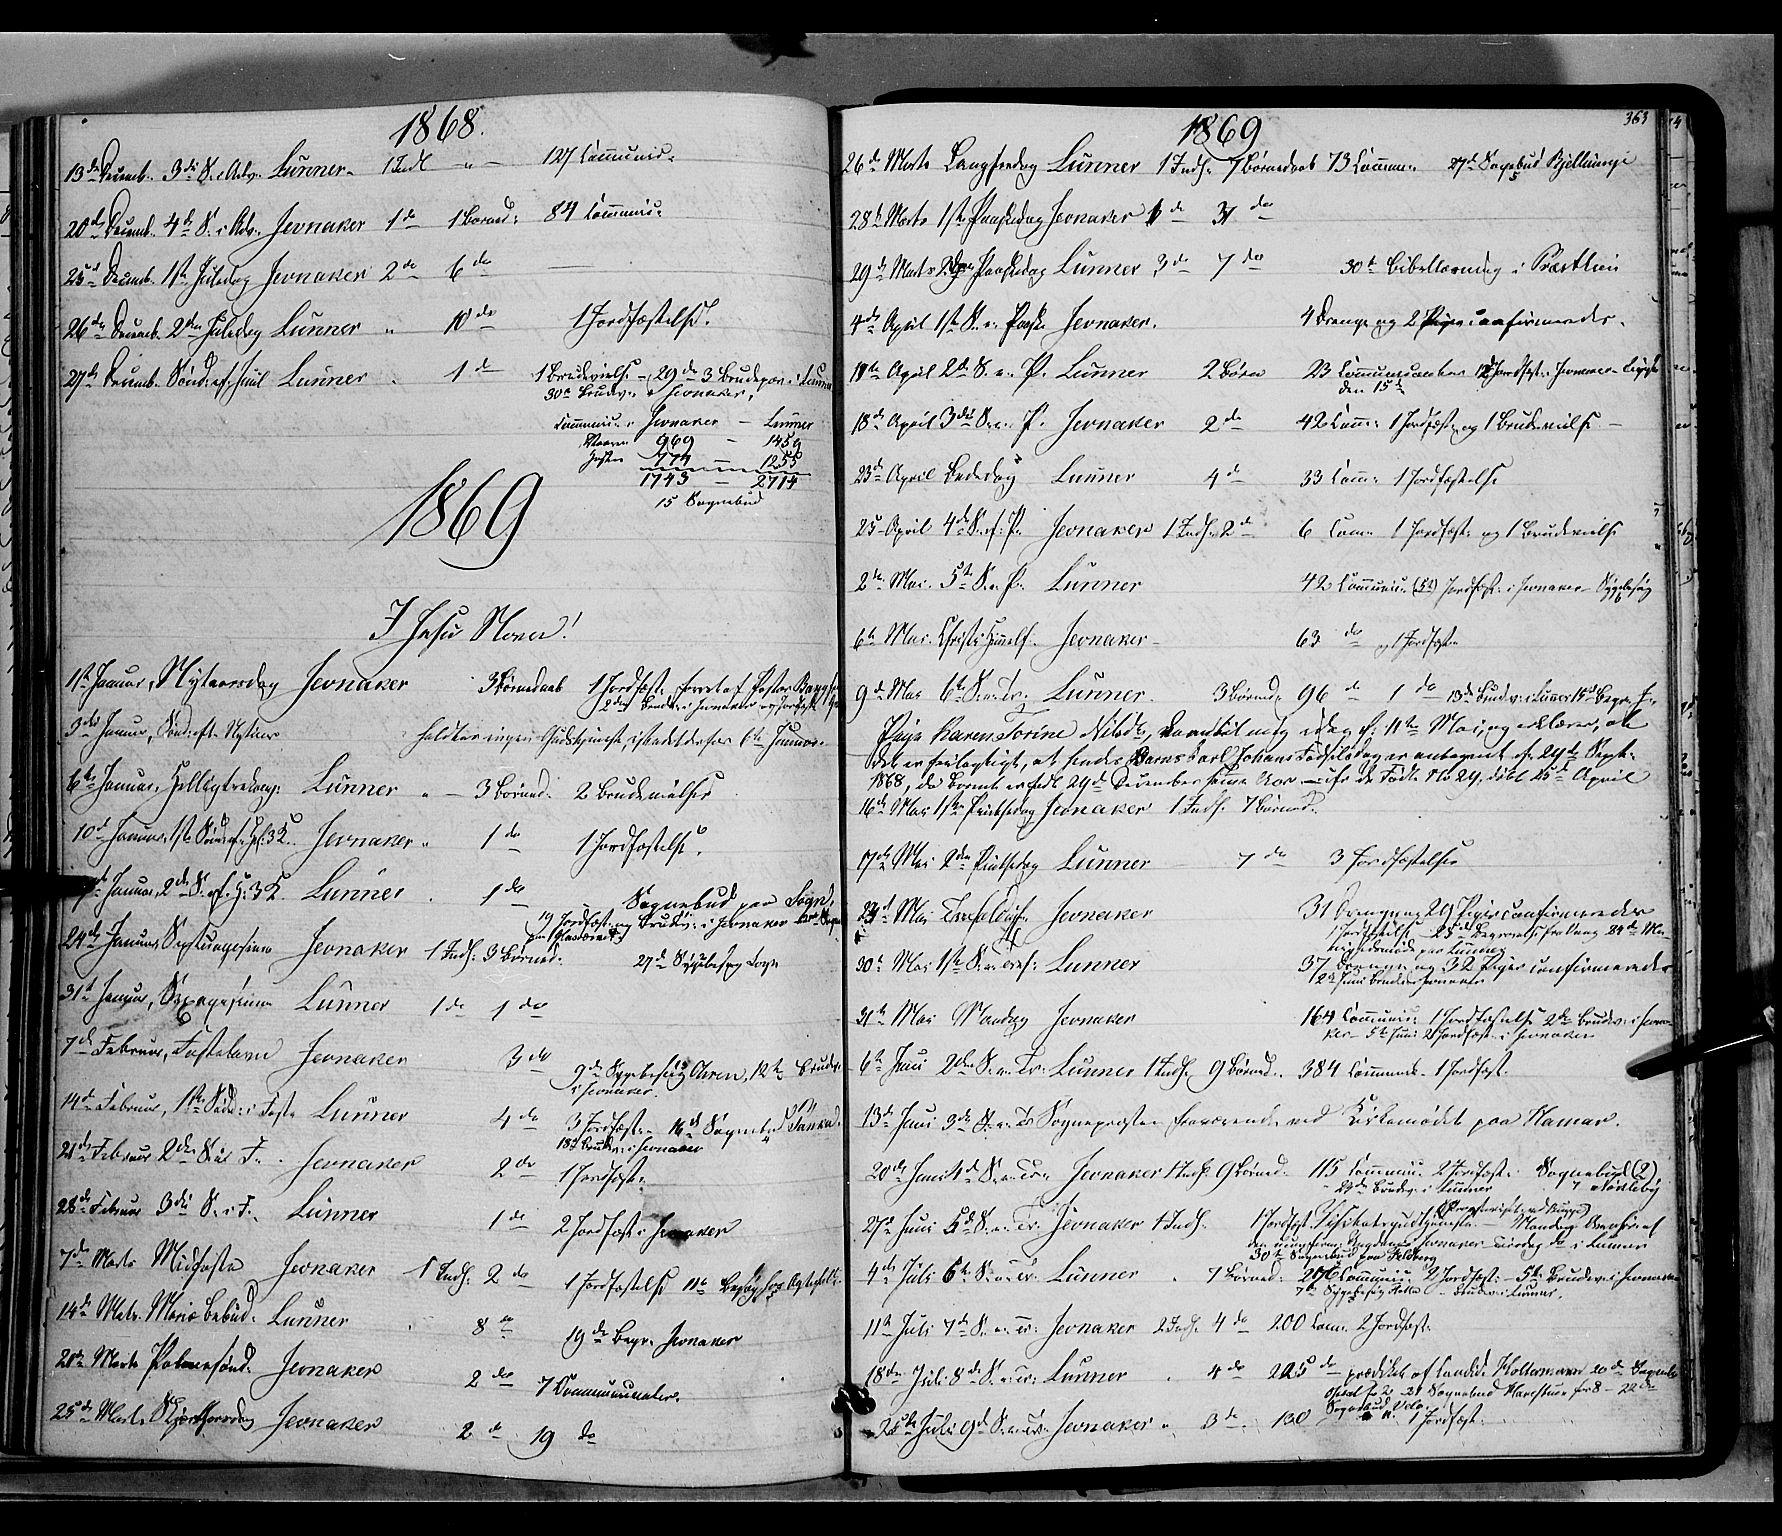 SAH, Jevnaker prestekontor, Ministerialbok nr. 7, 1858-1876, s. 363